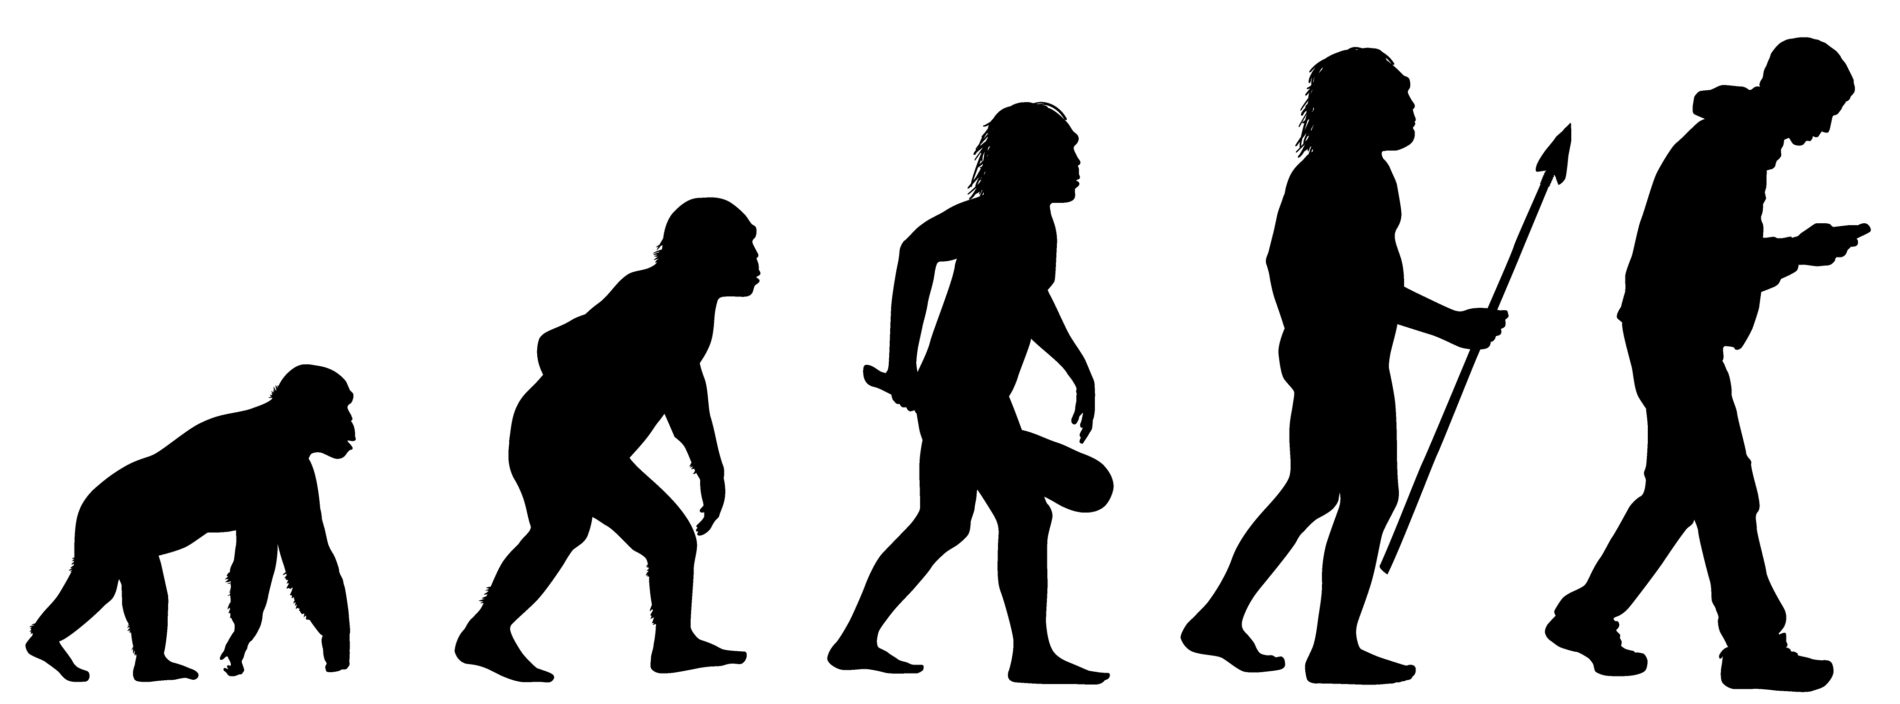 Scientistisk nyateism – fundamentalistisk vetenskapstro